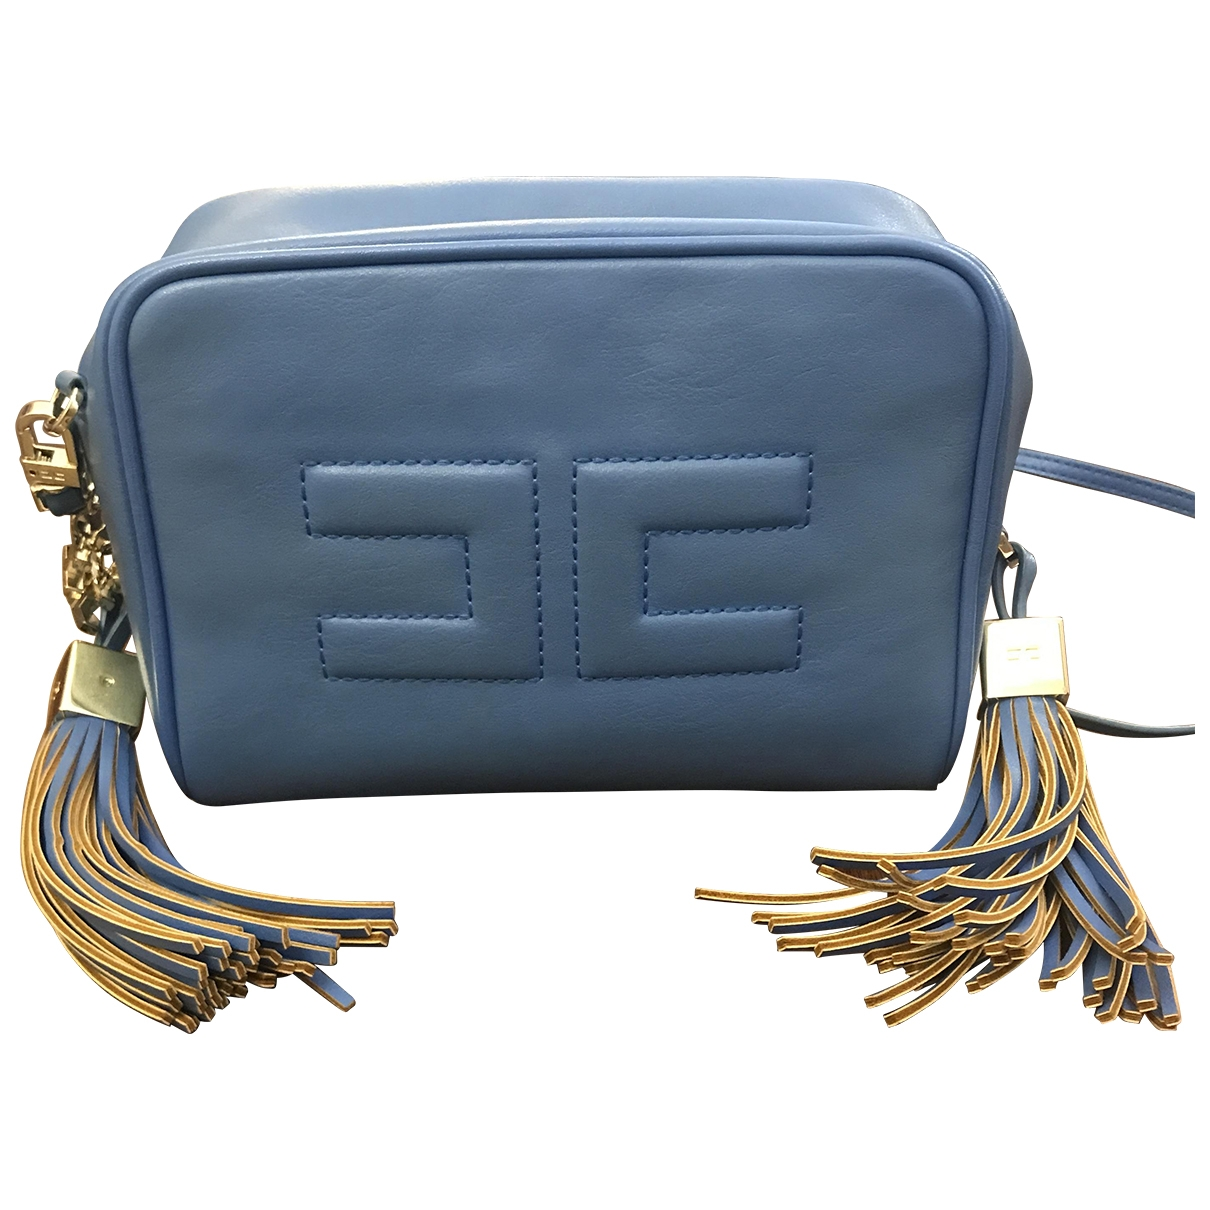 Elisabetta Franchi \N Turquoise handbag for Women \N